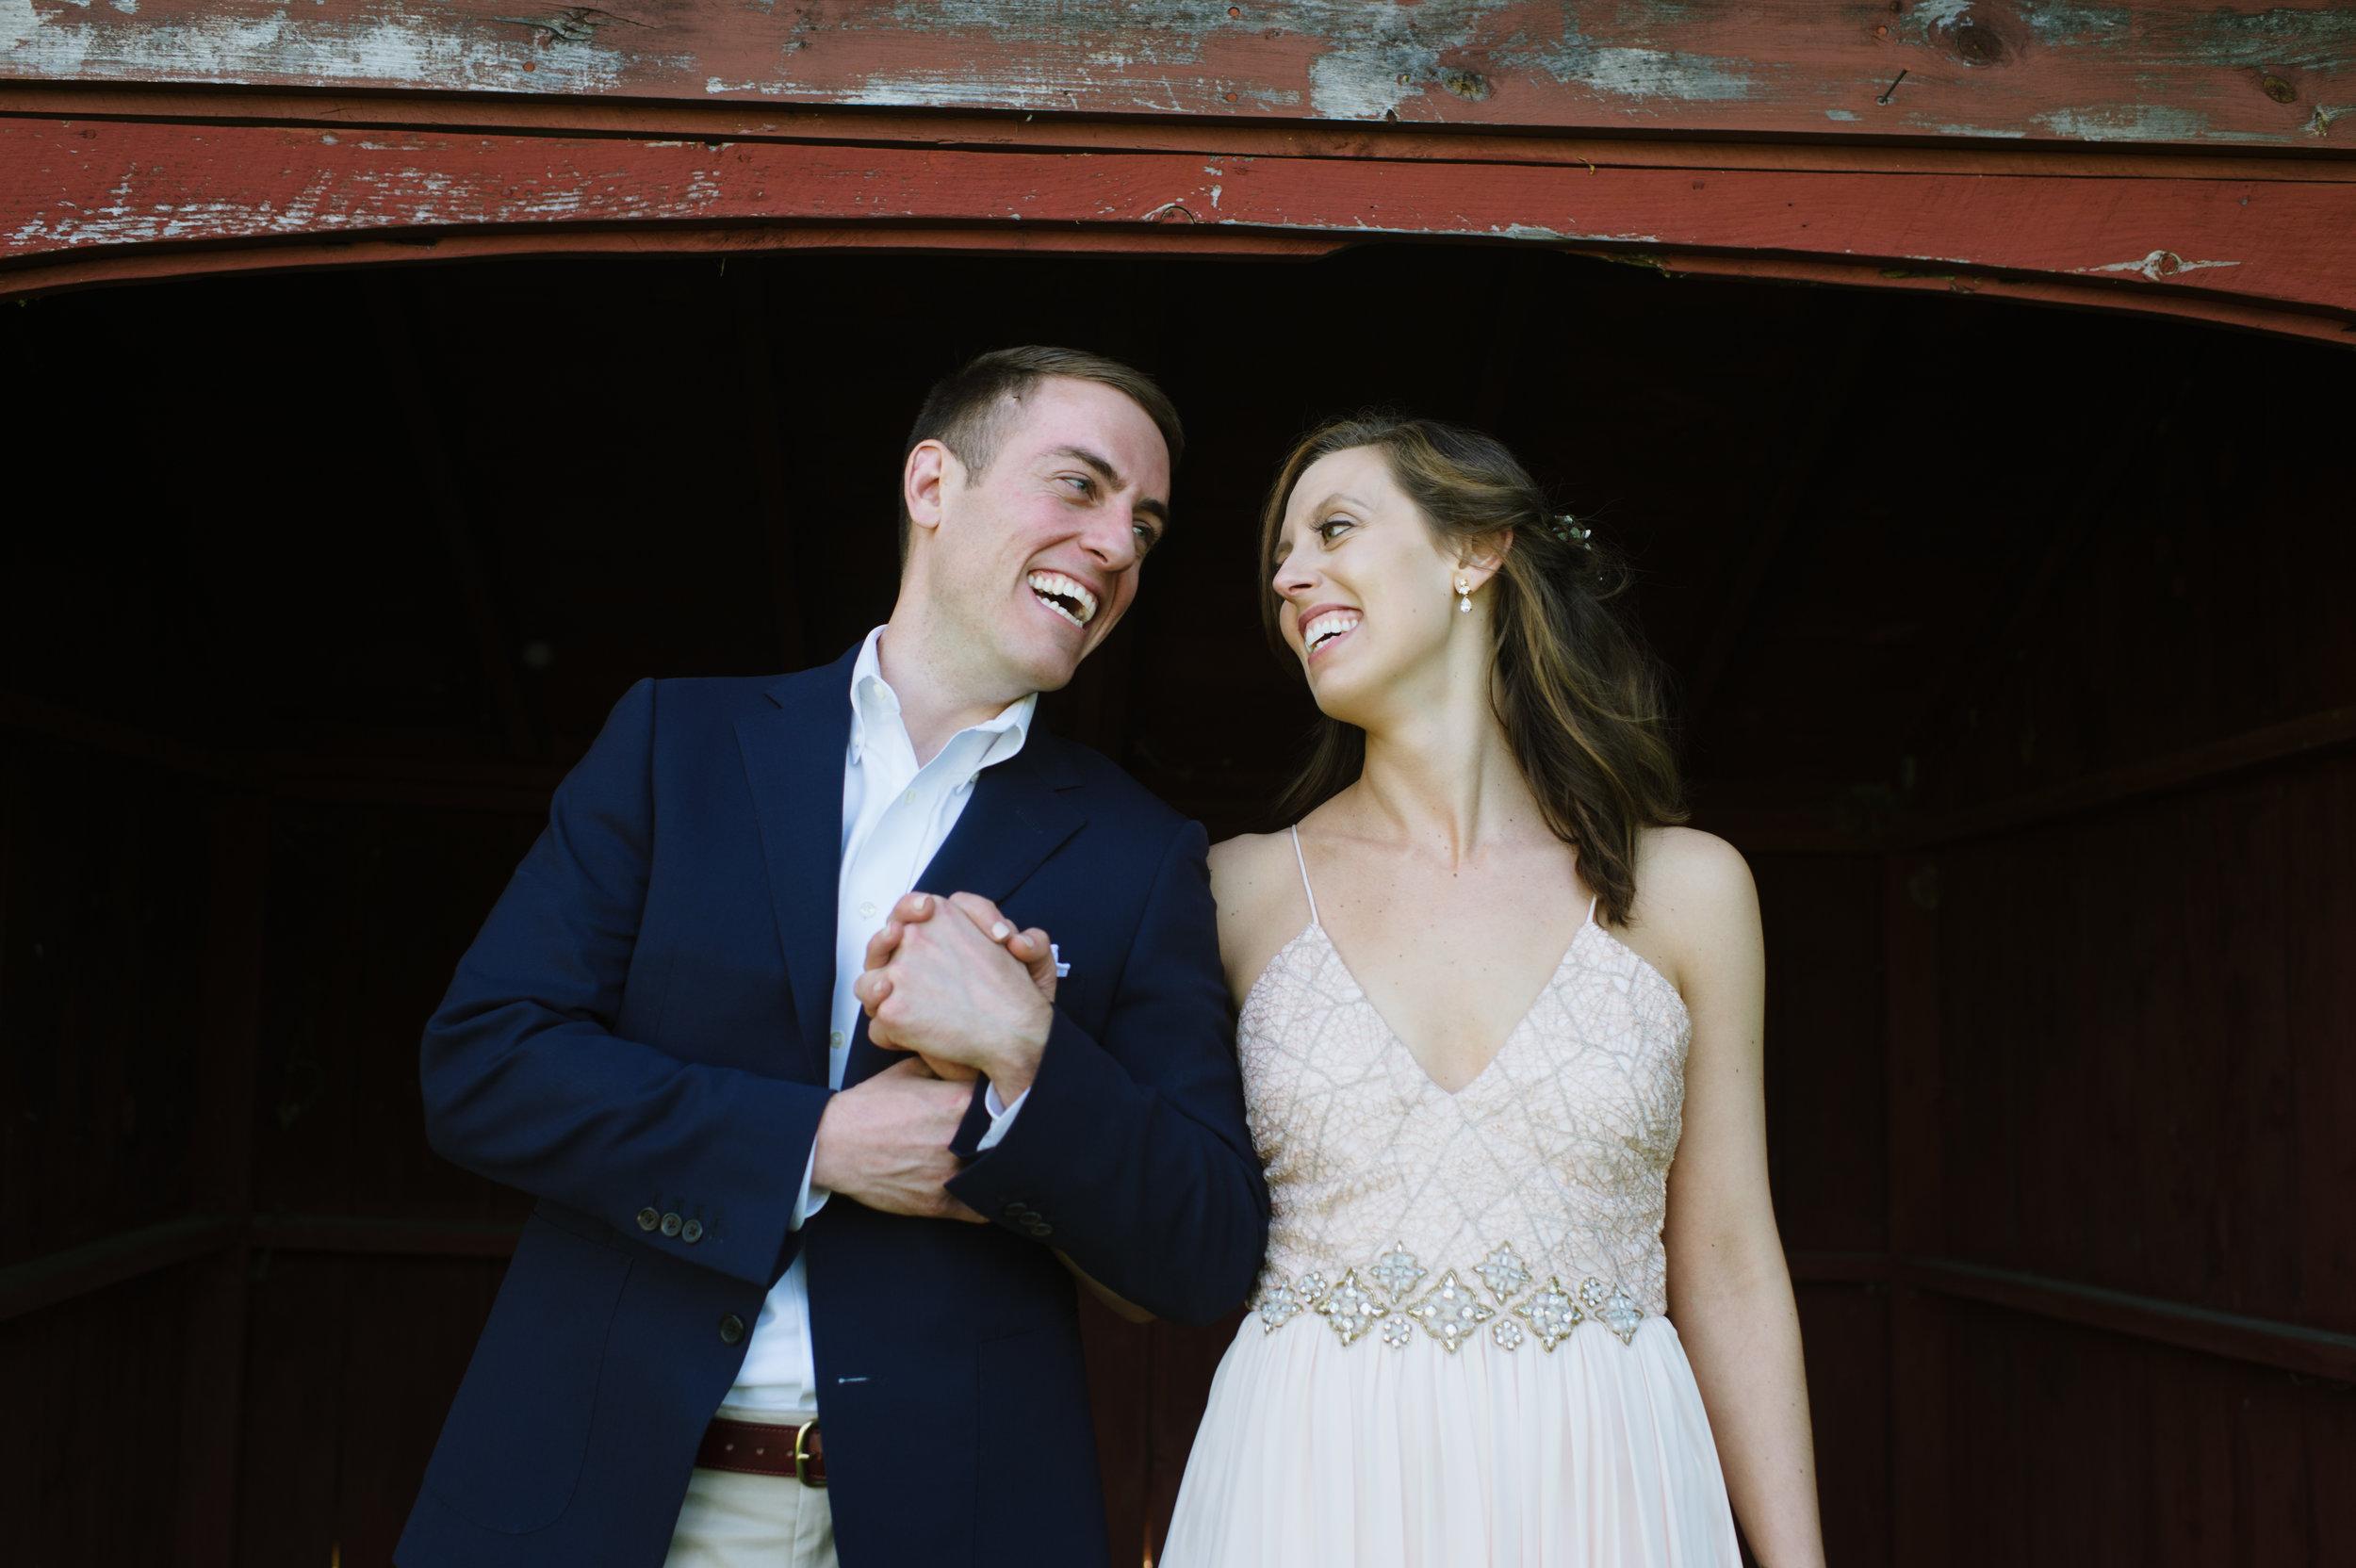 Candid-Wedding-Photography-Boston014.jpg